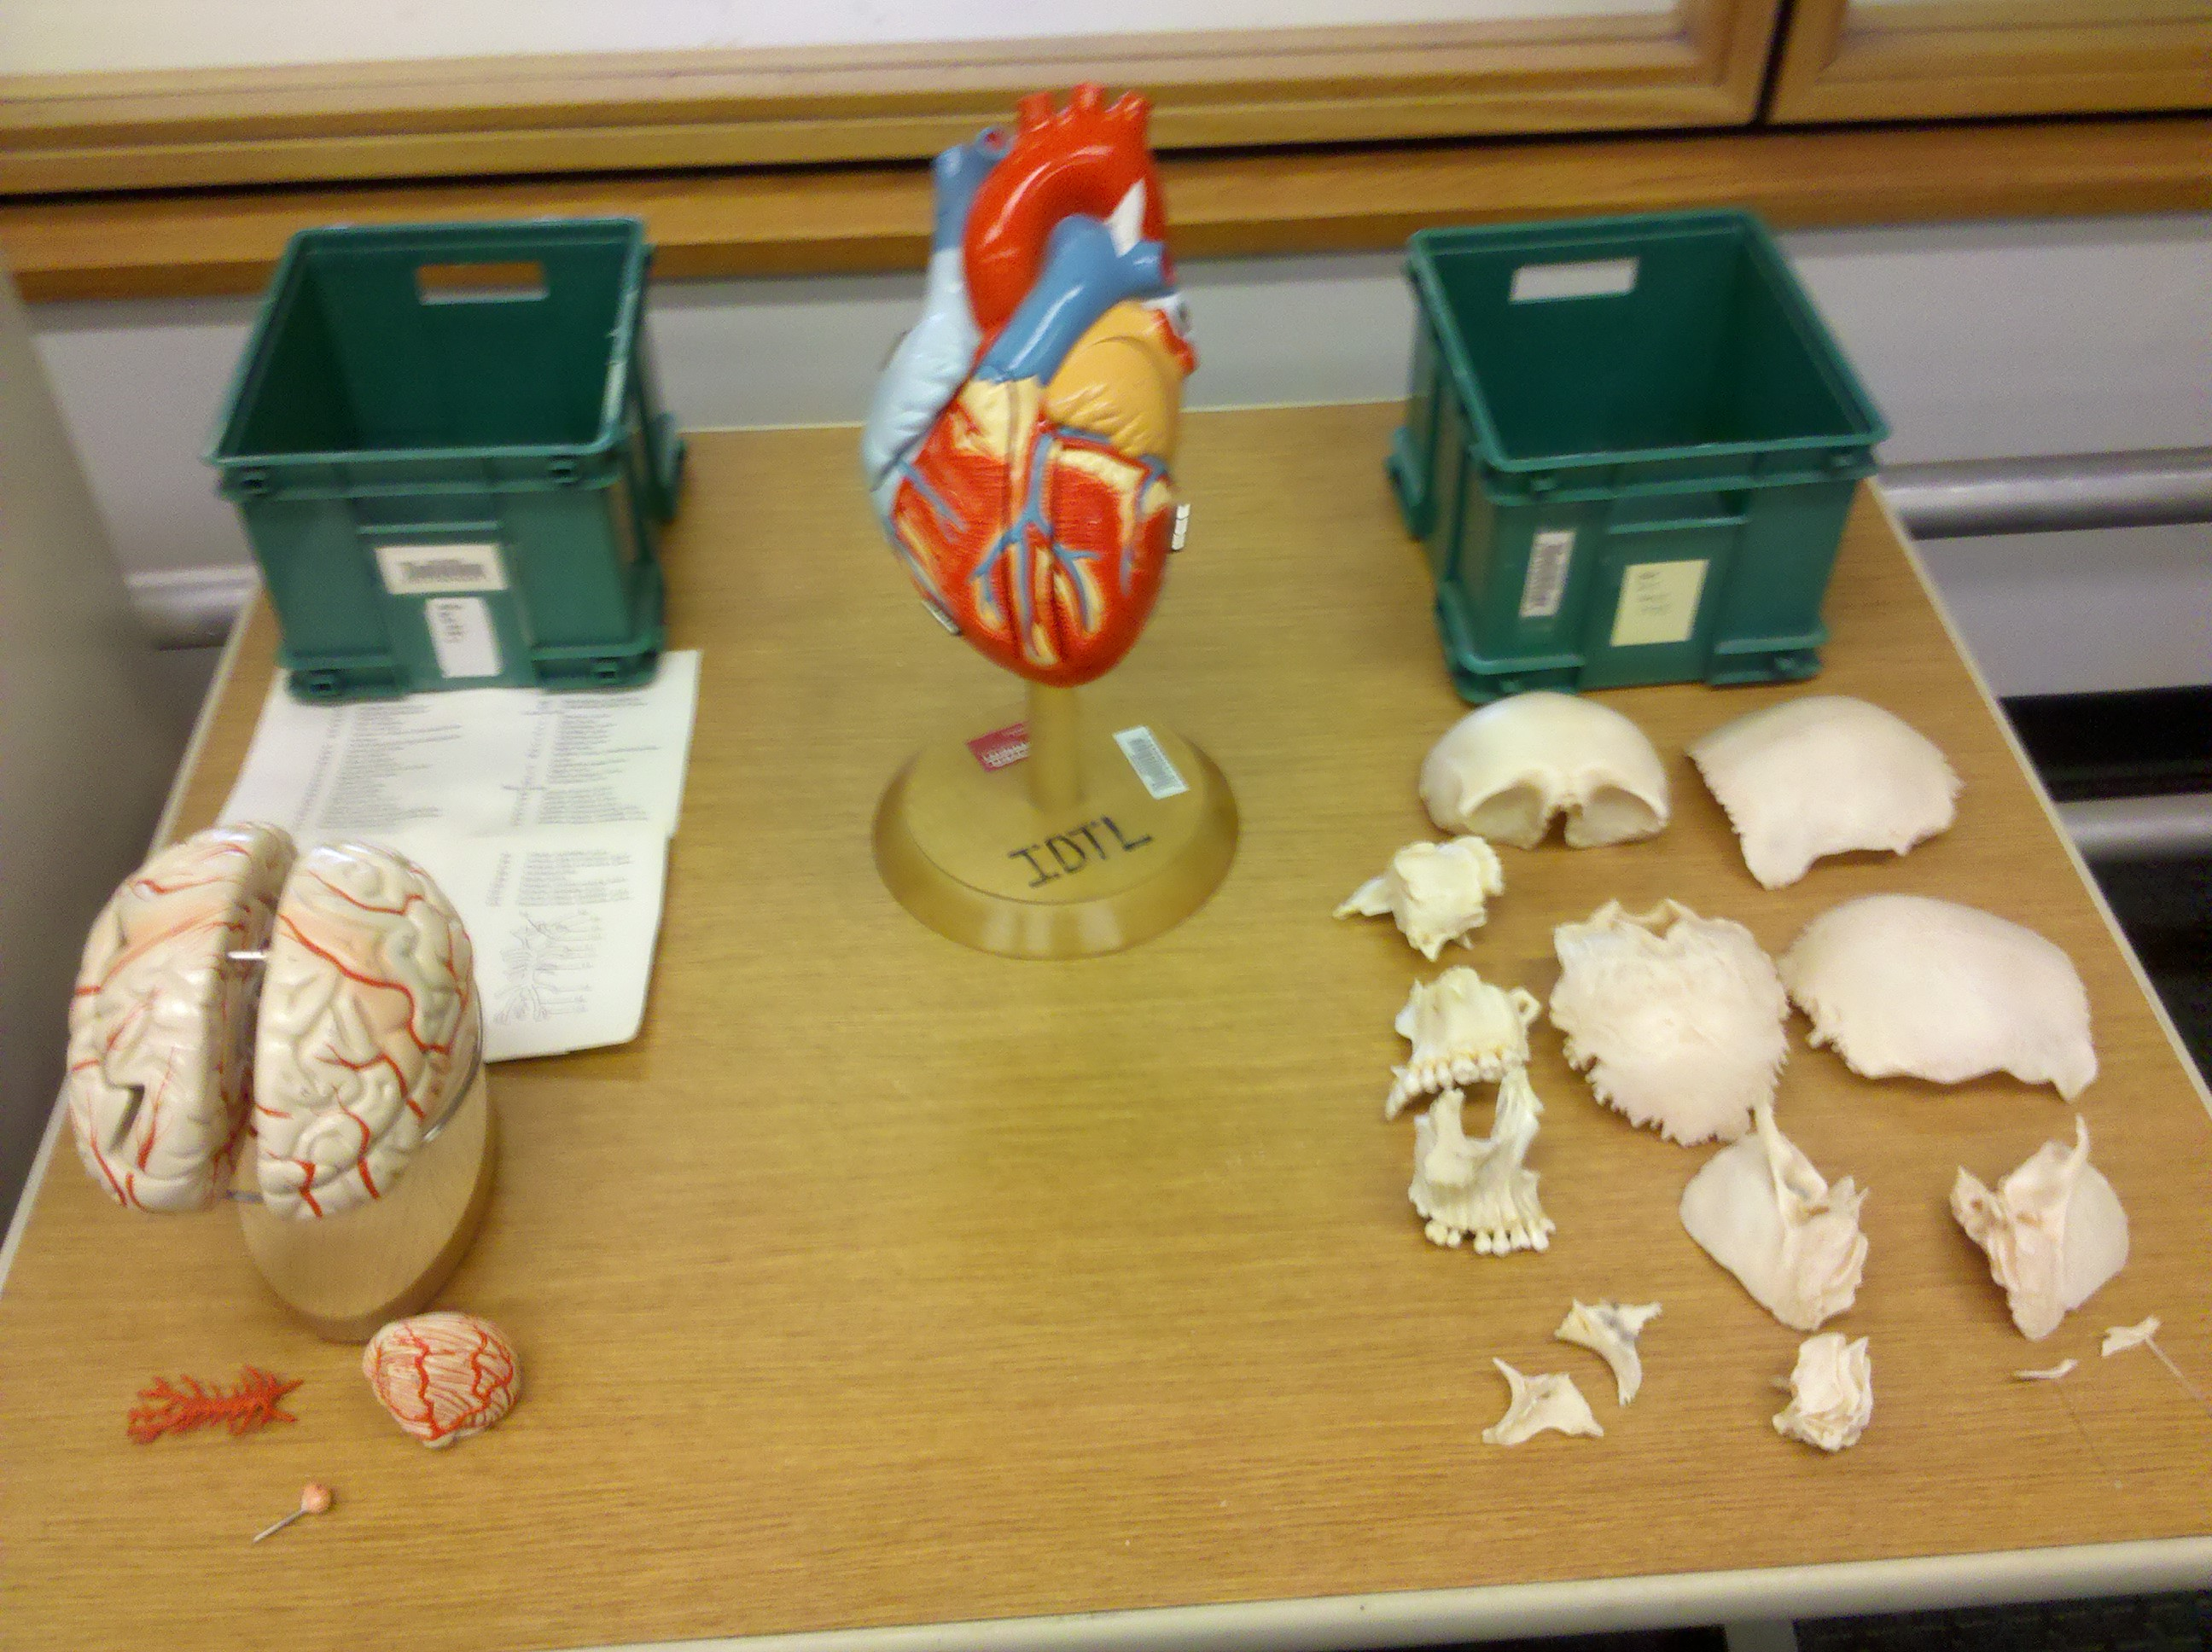 image of Brain, heart, and skull models